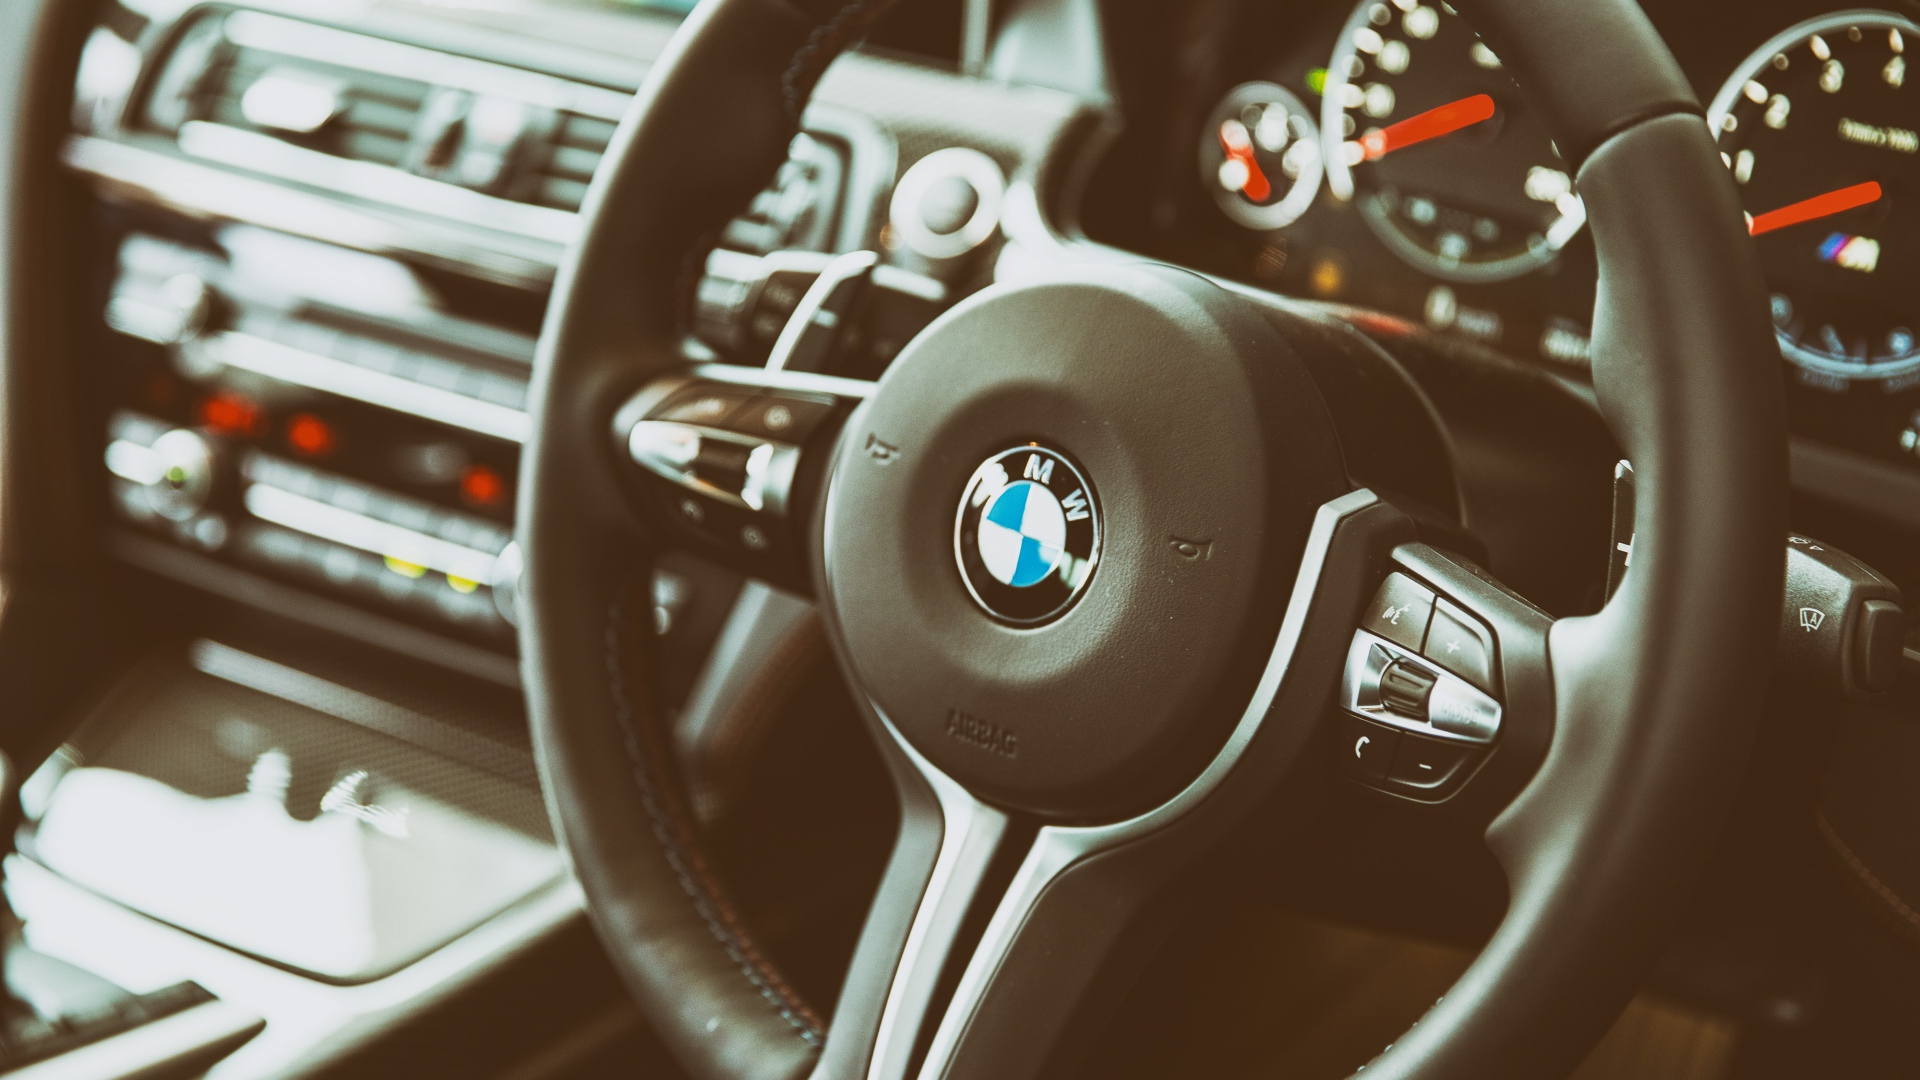 bmw_m6_interior_steering_wheel_106199_1920x1080